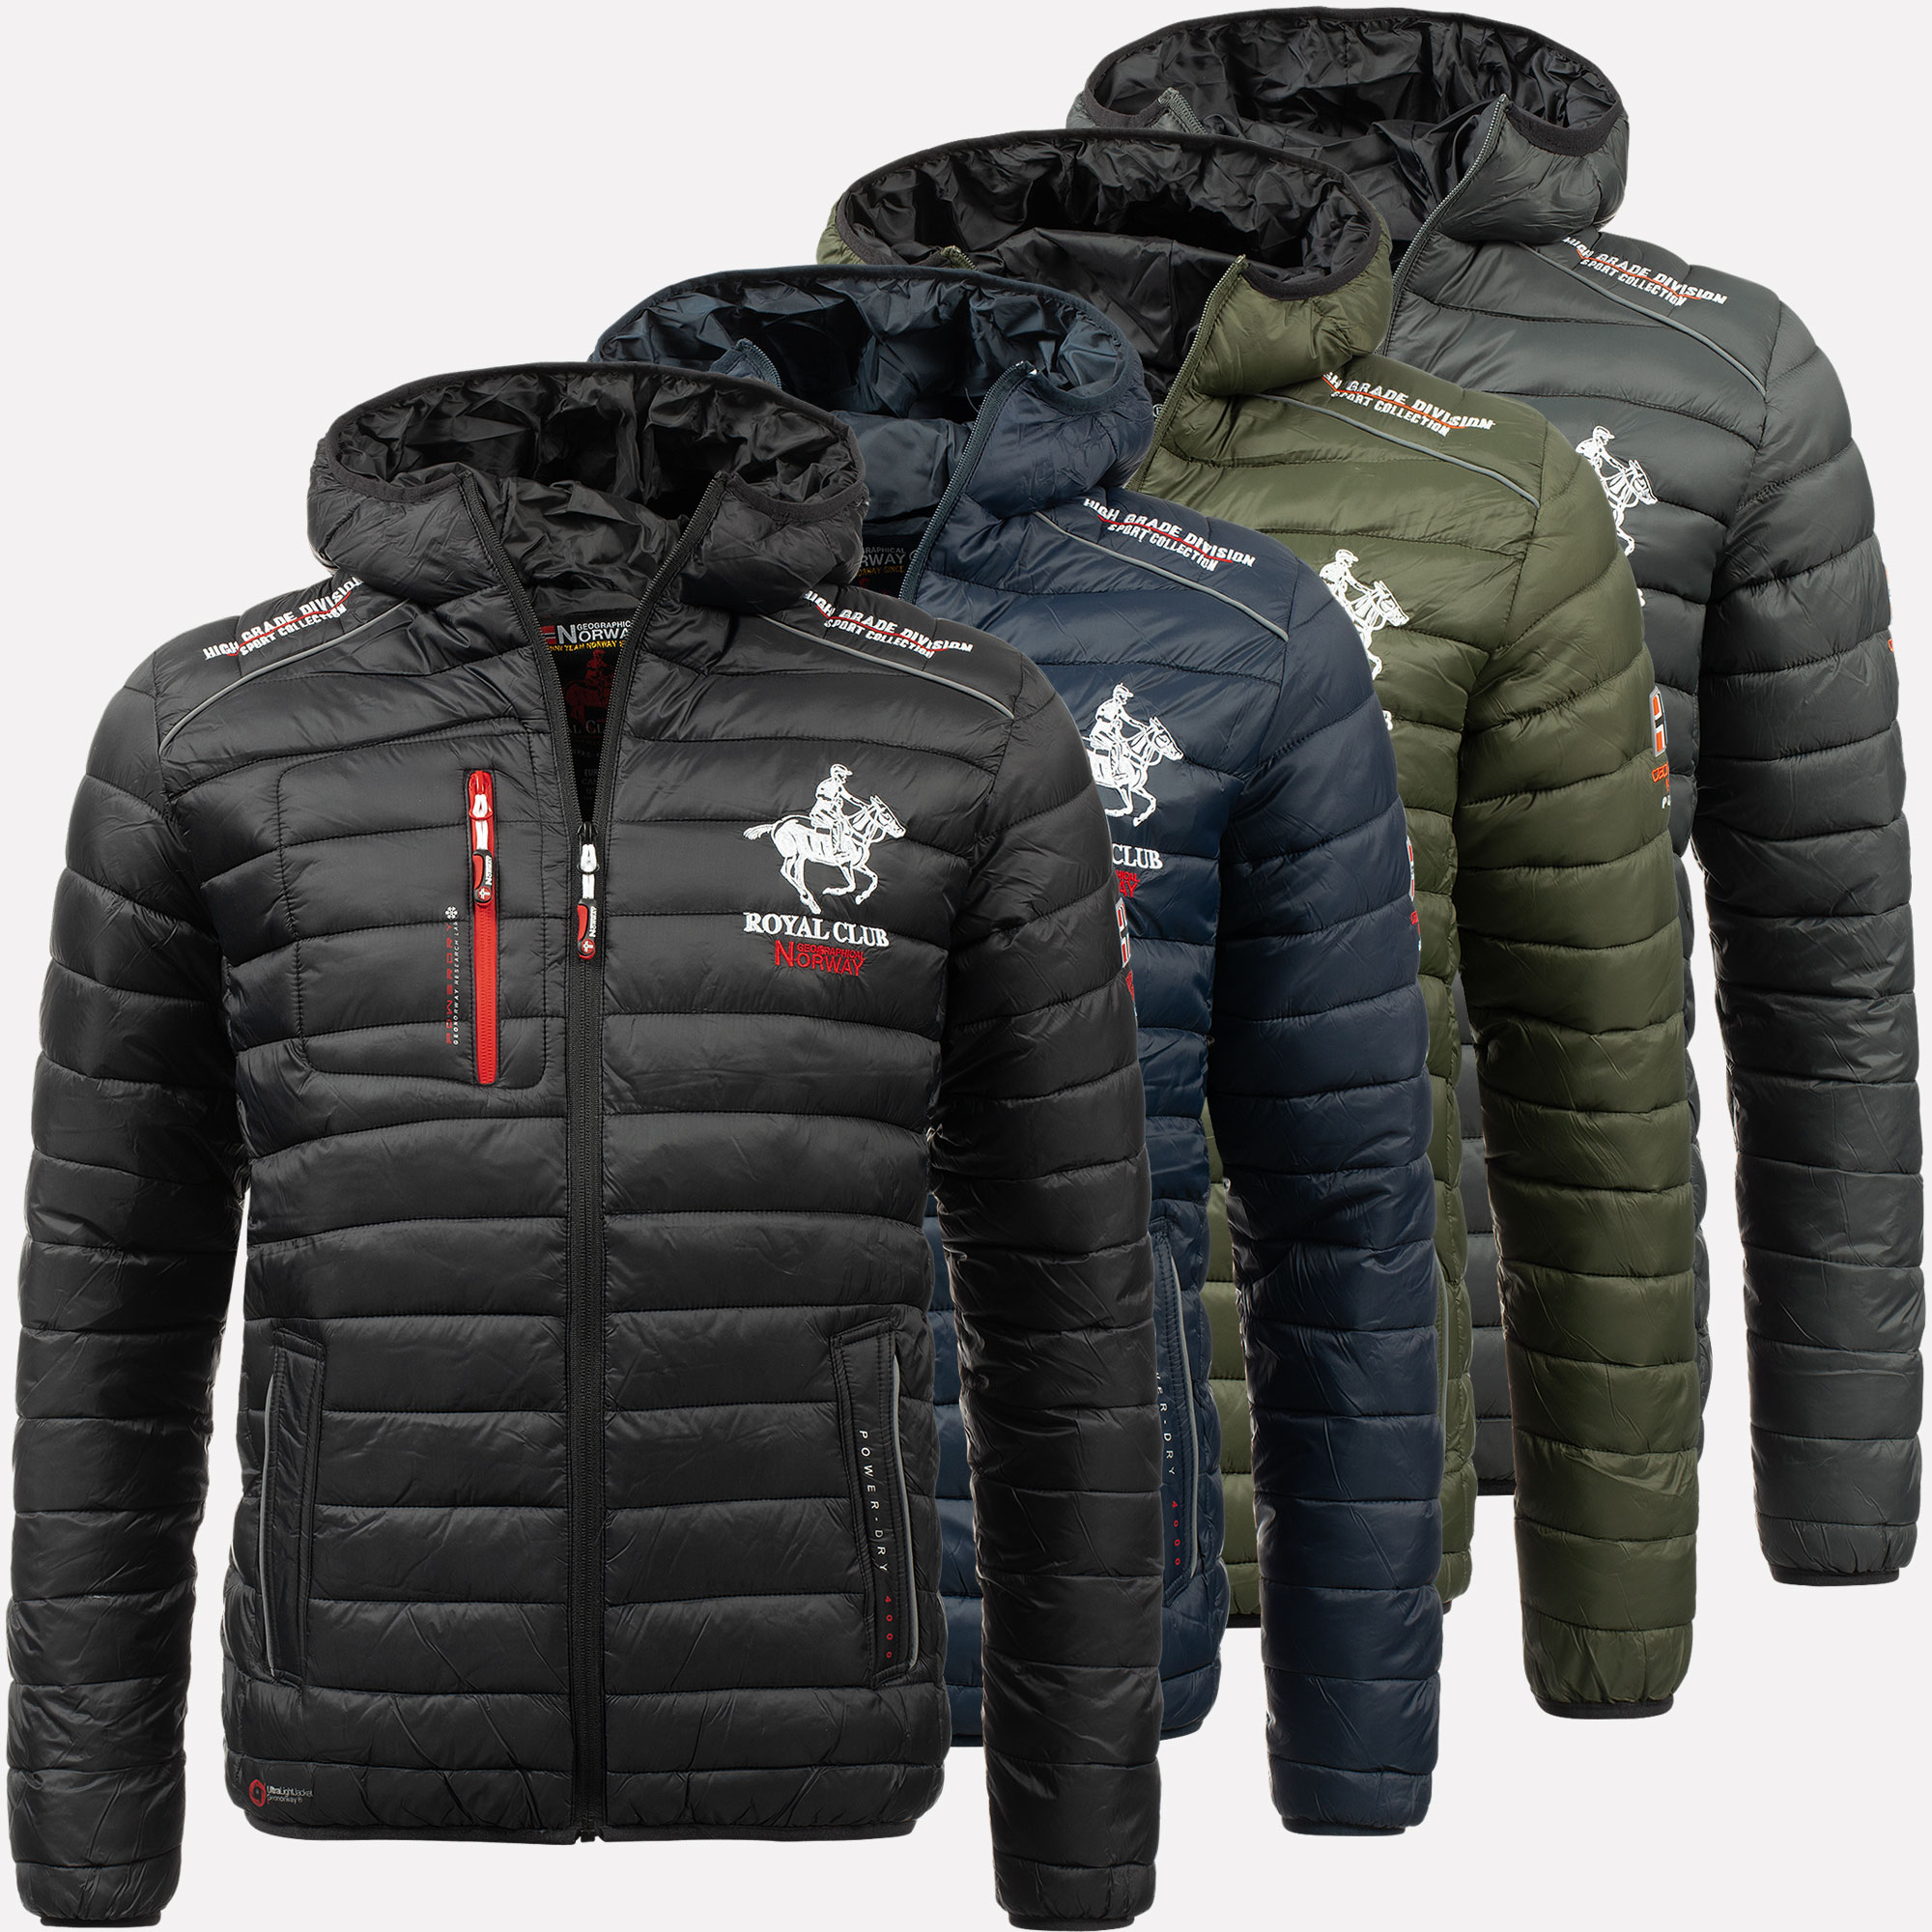 Geographical Norway sehr warm Damen Winterjacke Parka Mantel Jacke warm S-XXL